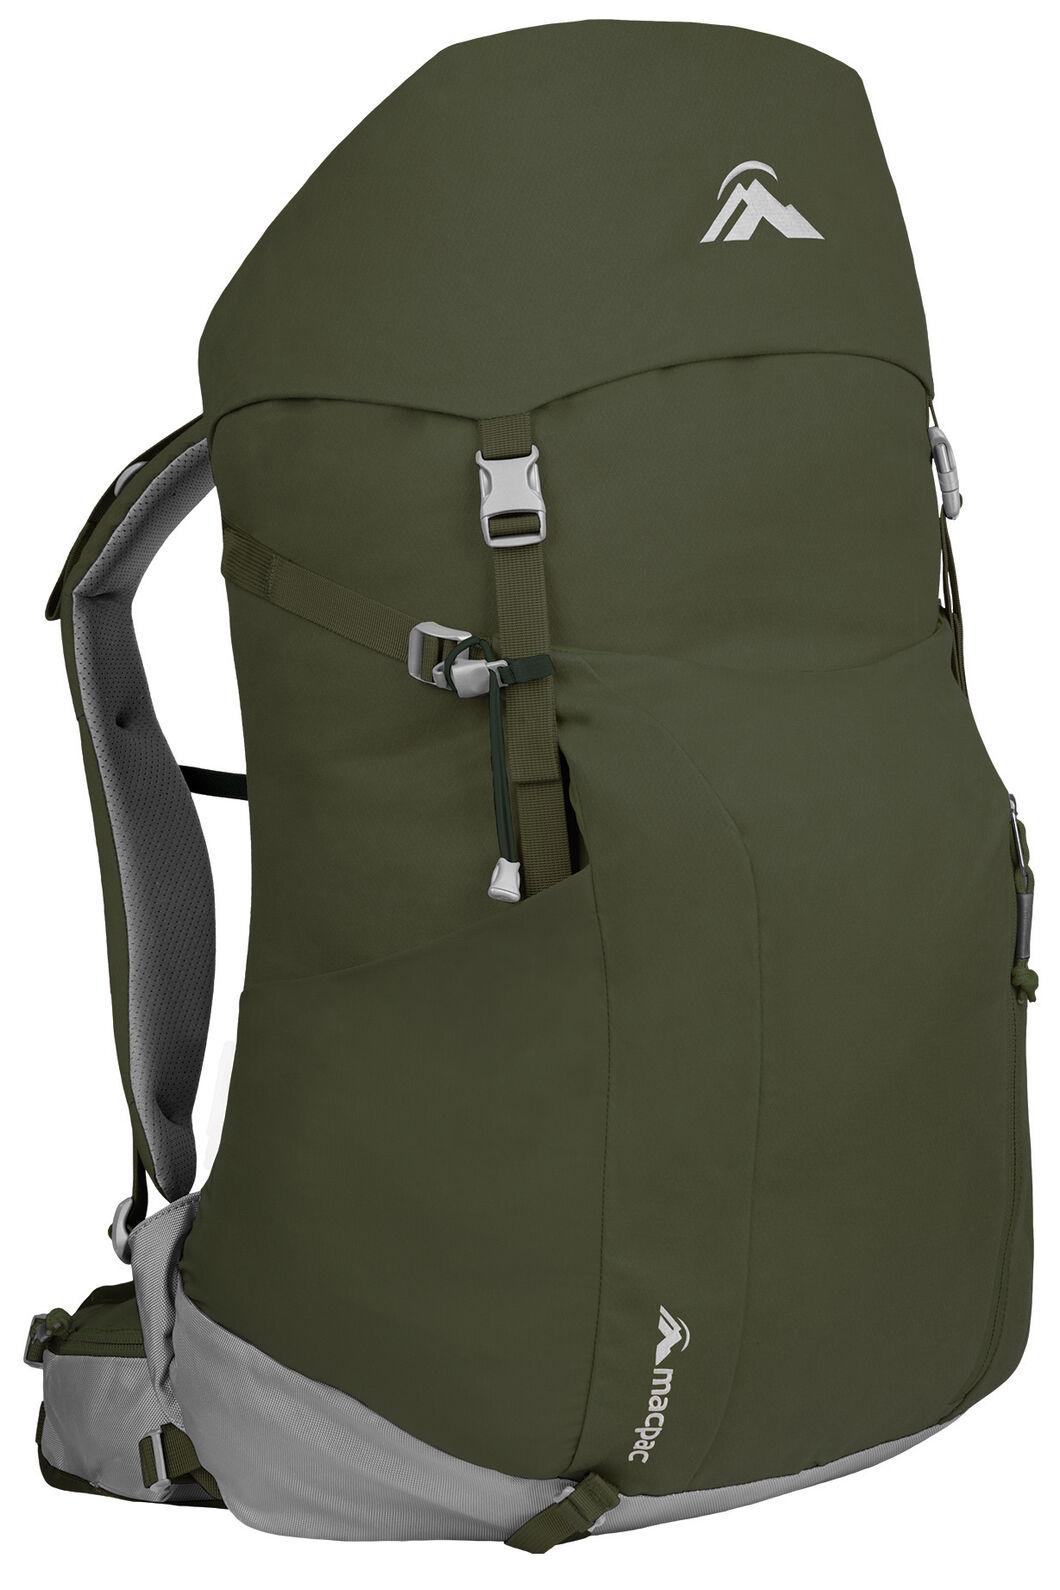 Macpac Weka 40L AzTec® Pack, Forest Night, hi-res